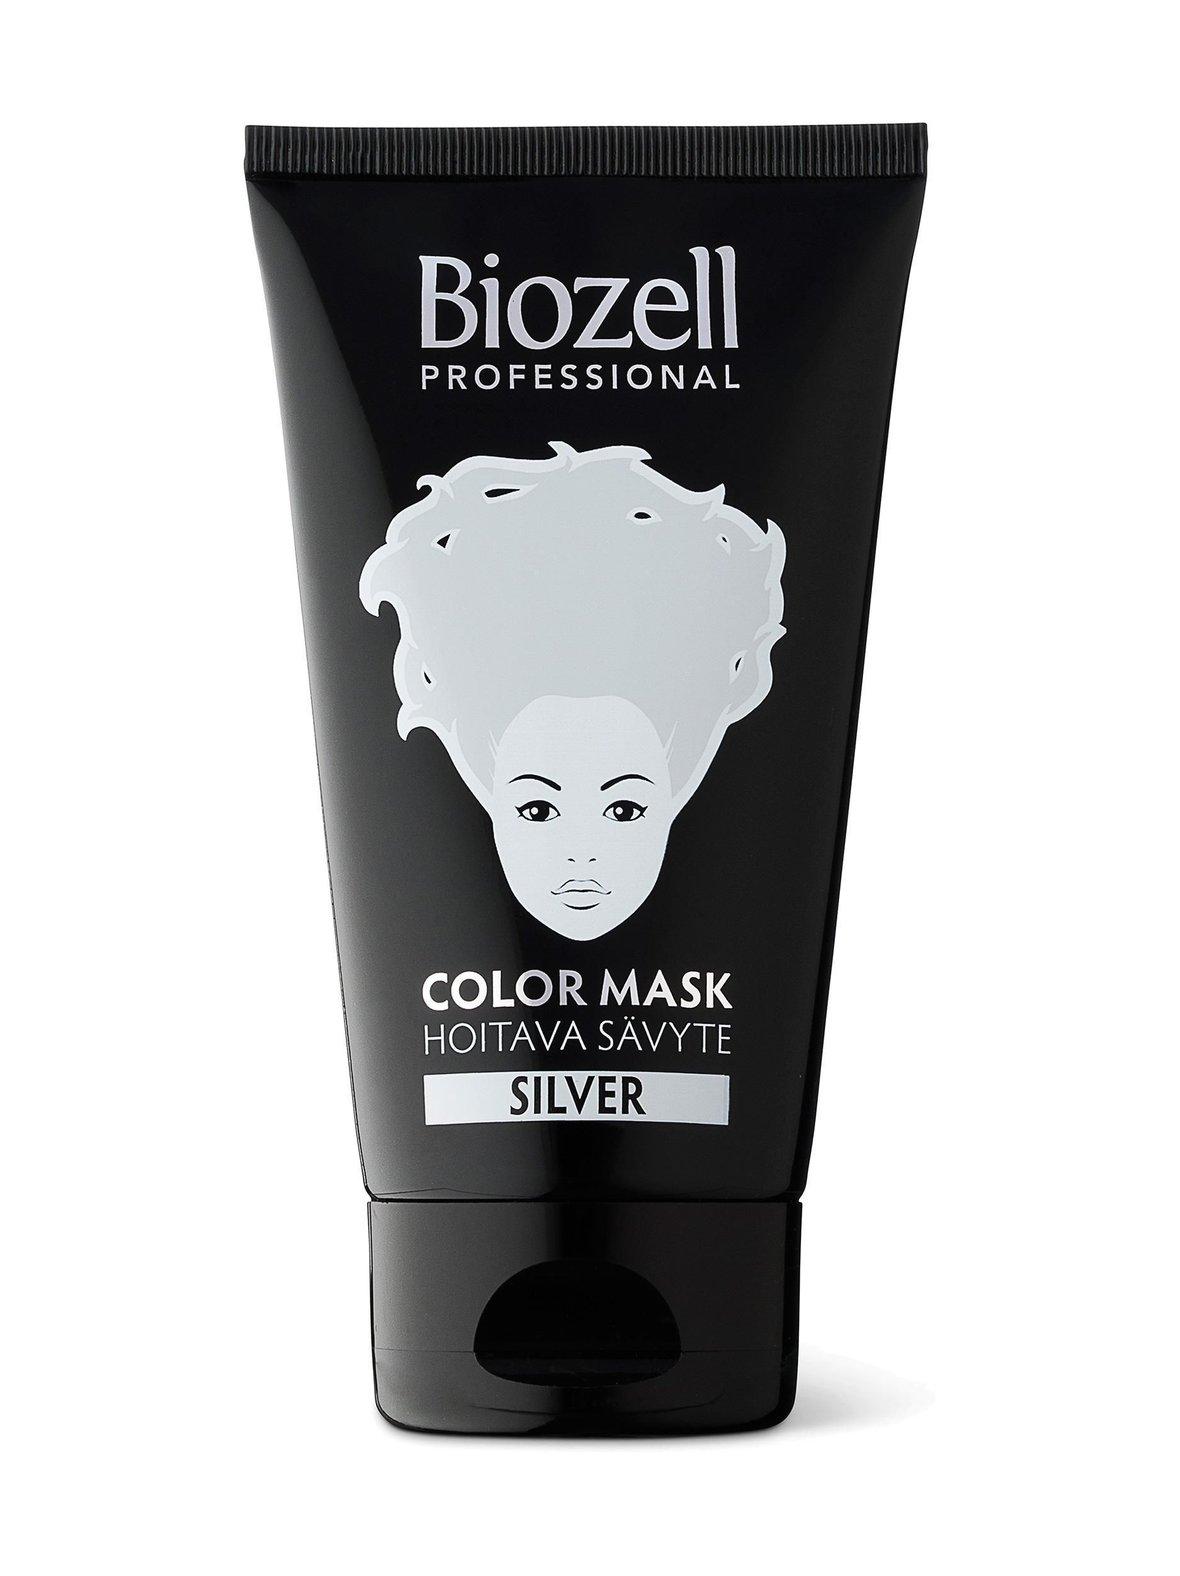 silver (hopea) biozell color mask silver -sävyte 150 ml | 150 ml